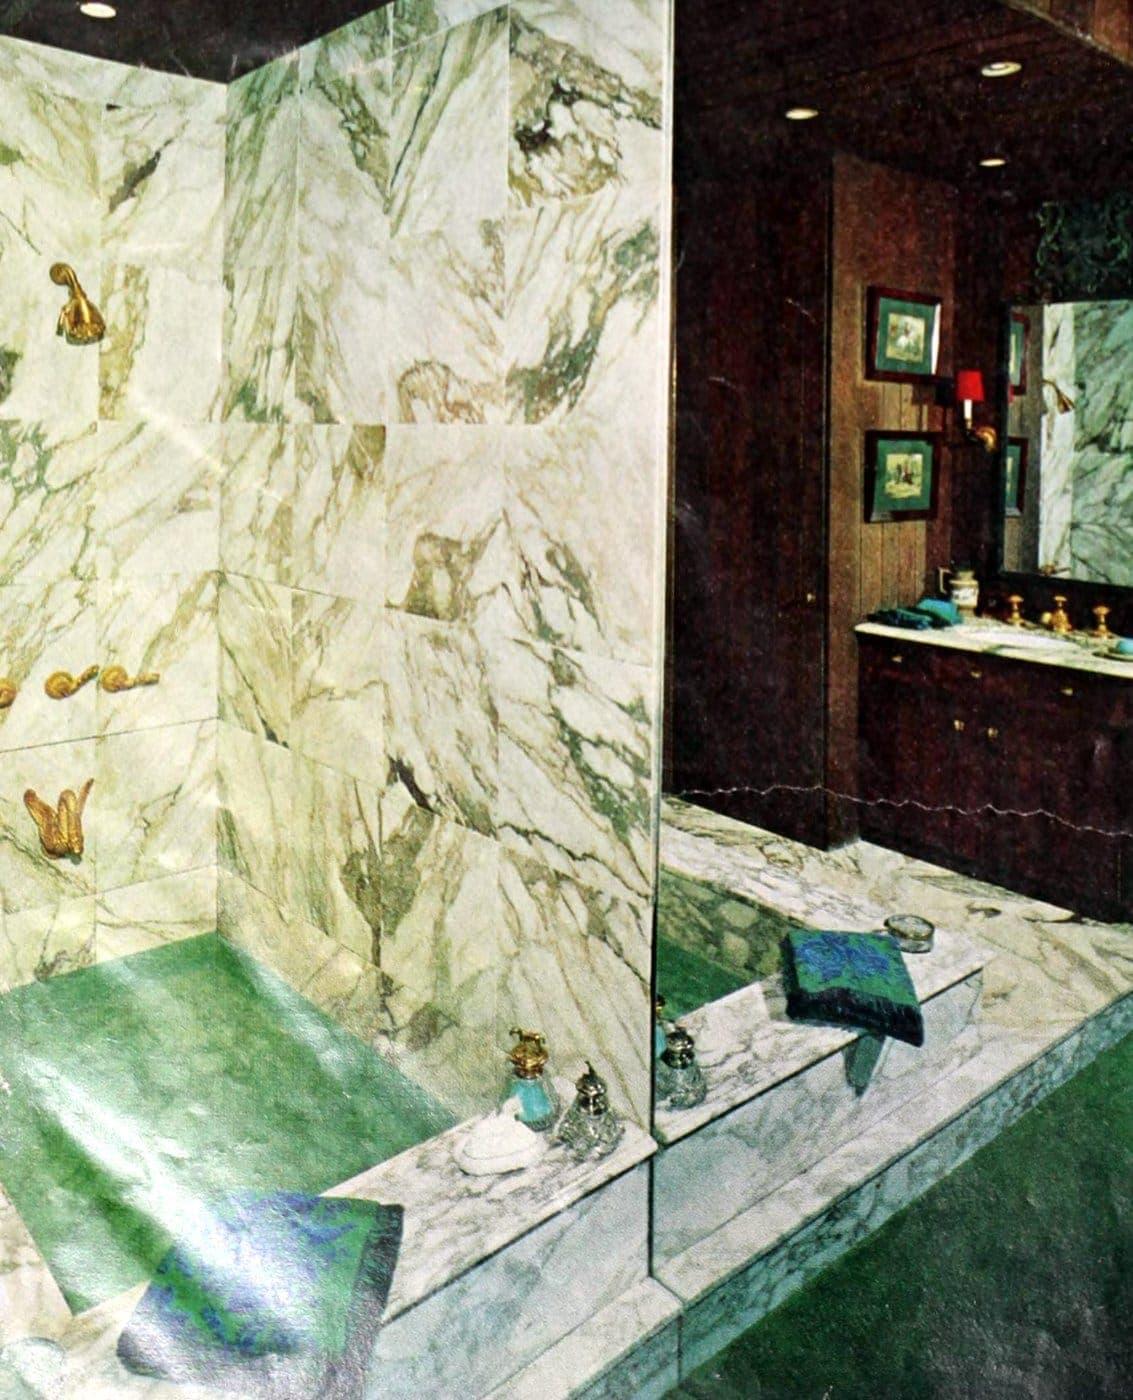 Vintage 60s bathroom decor ideas (5)